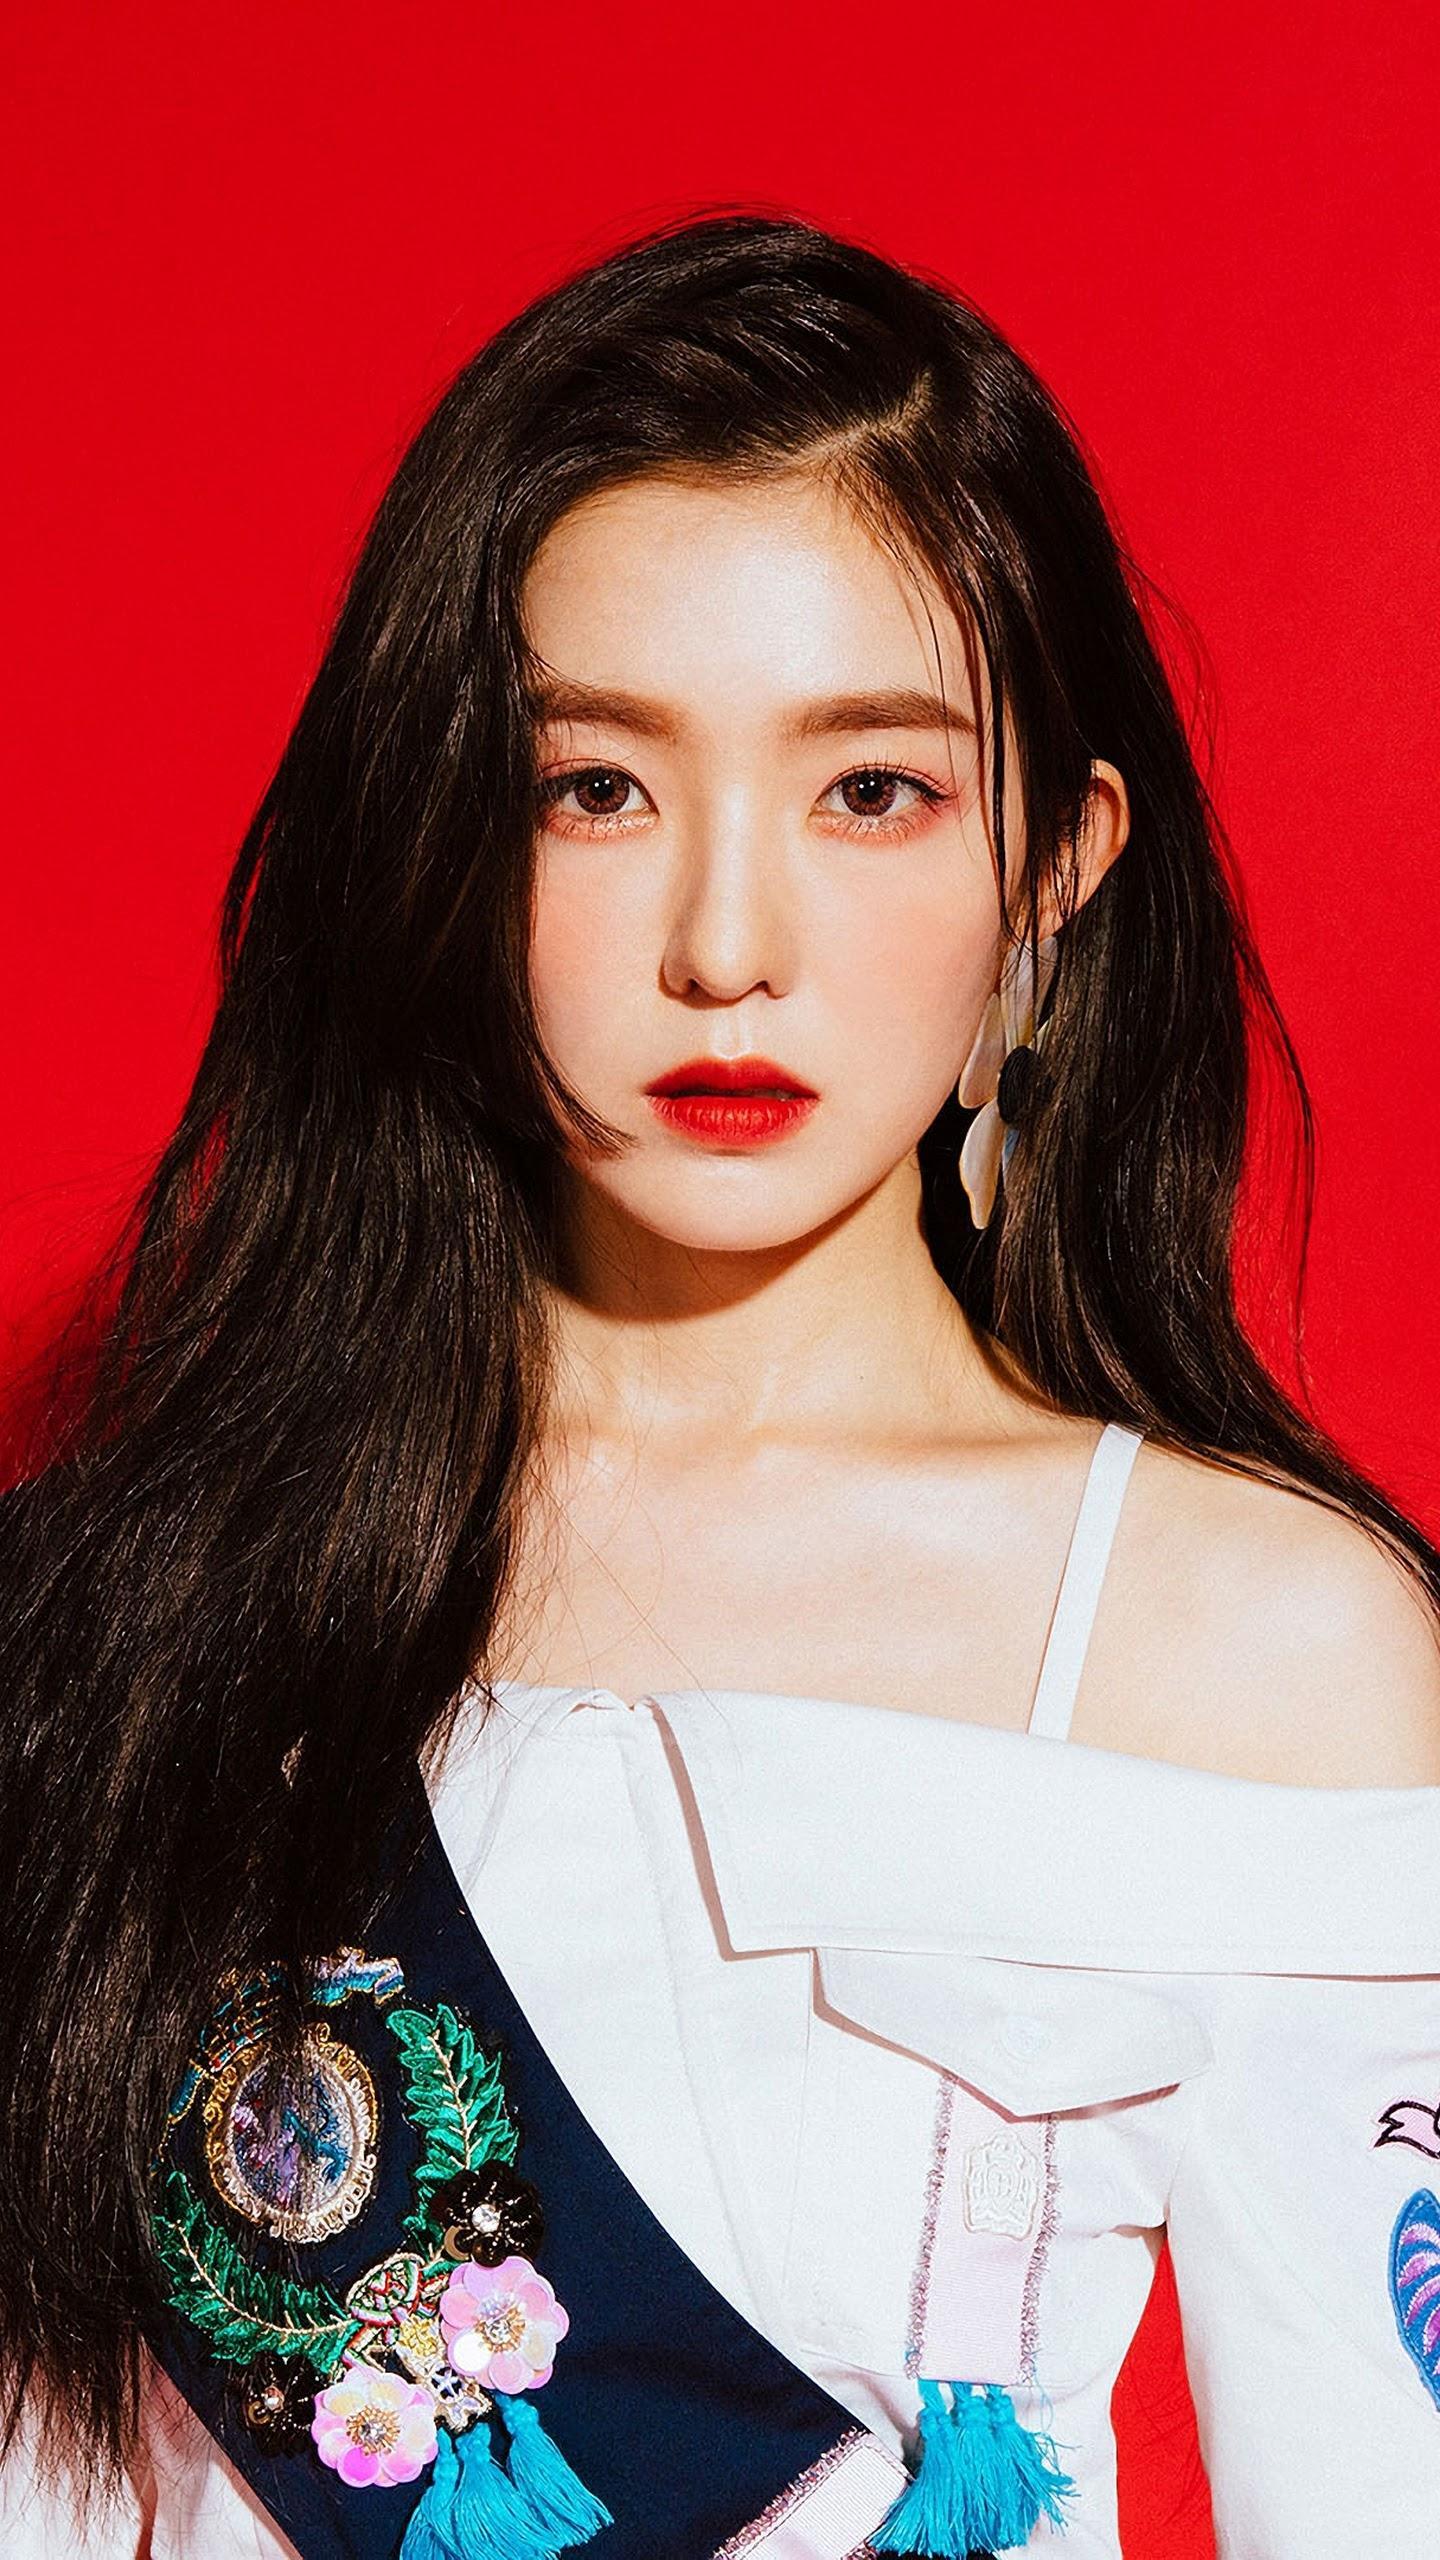 Irene Red Velvet Iphone Wallpapers Wallpaper Cave